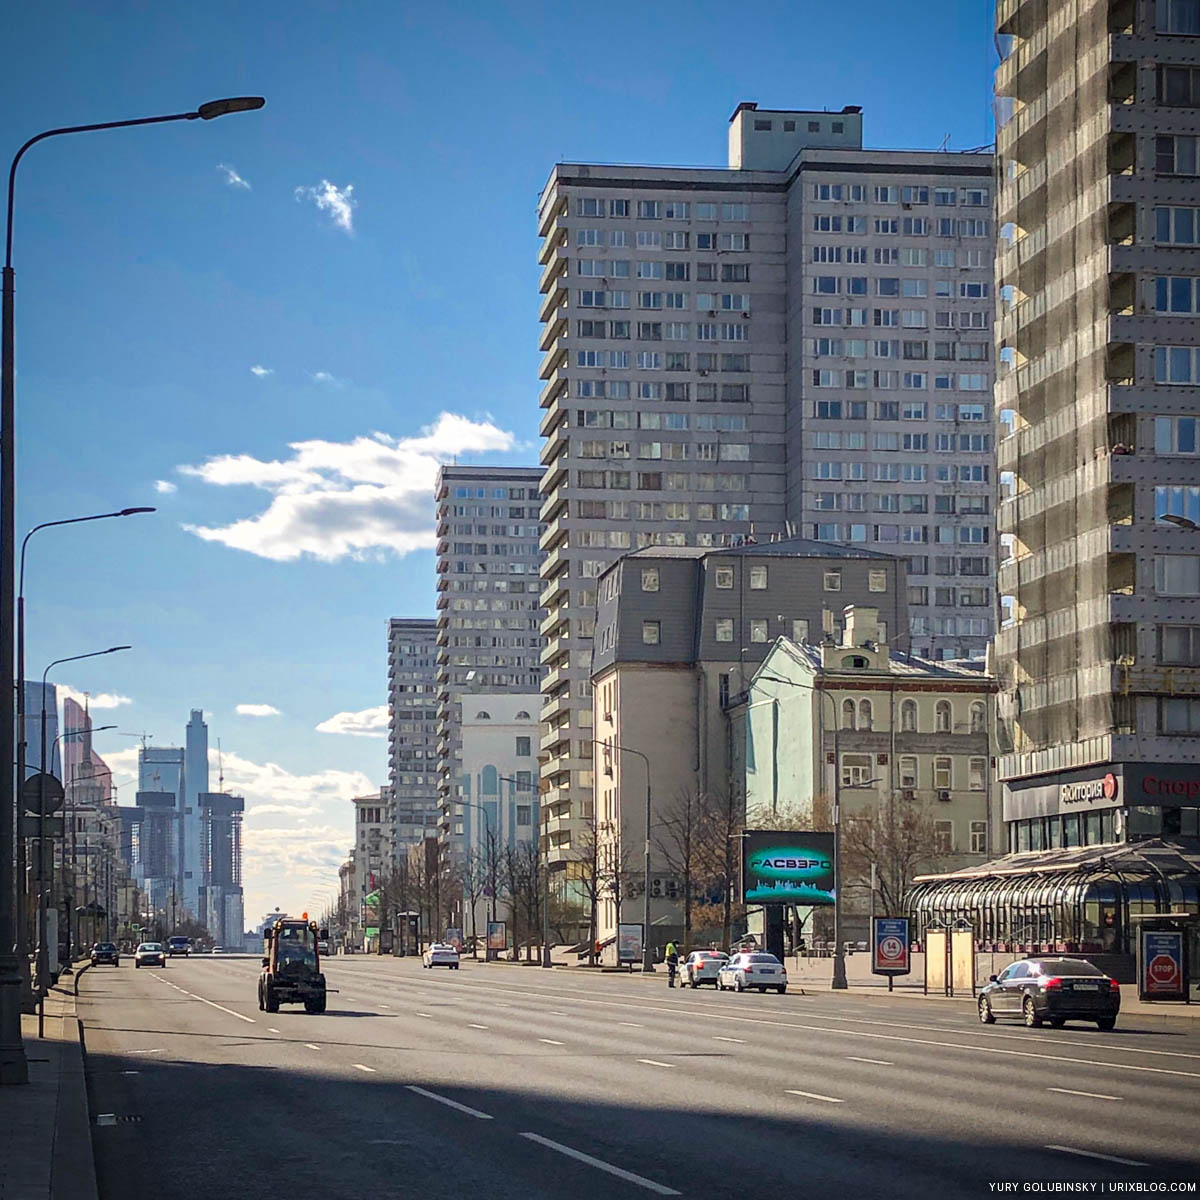 New Arbat street, empty streets, quarantine, self-isolation, Moscow, Russia